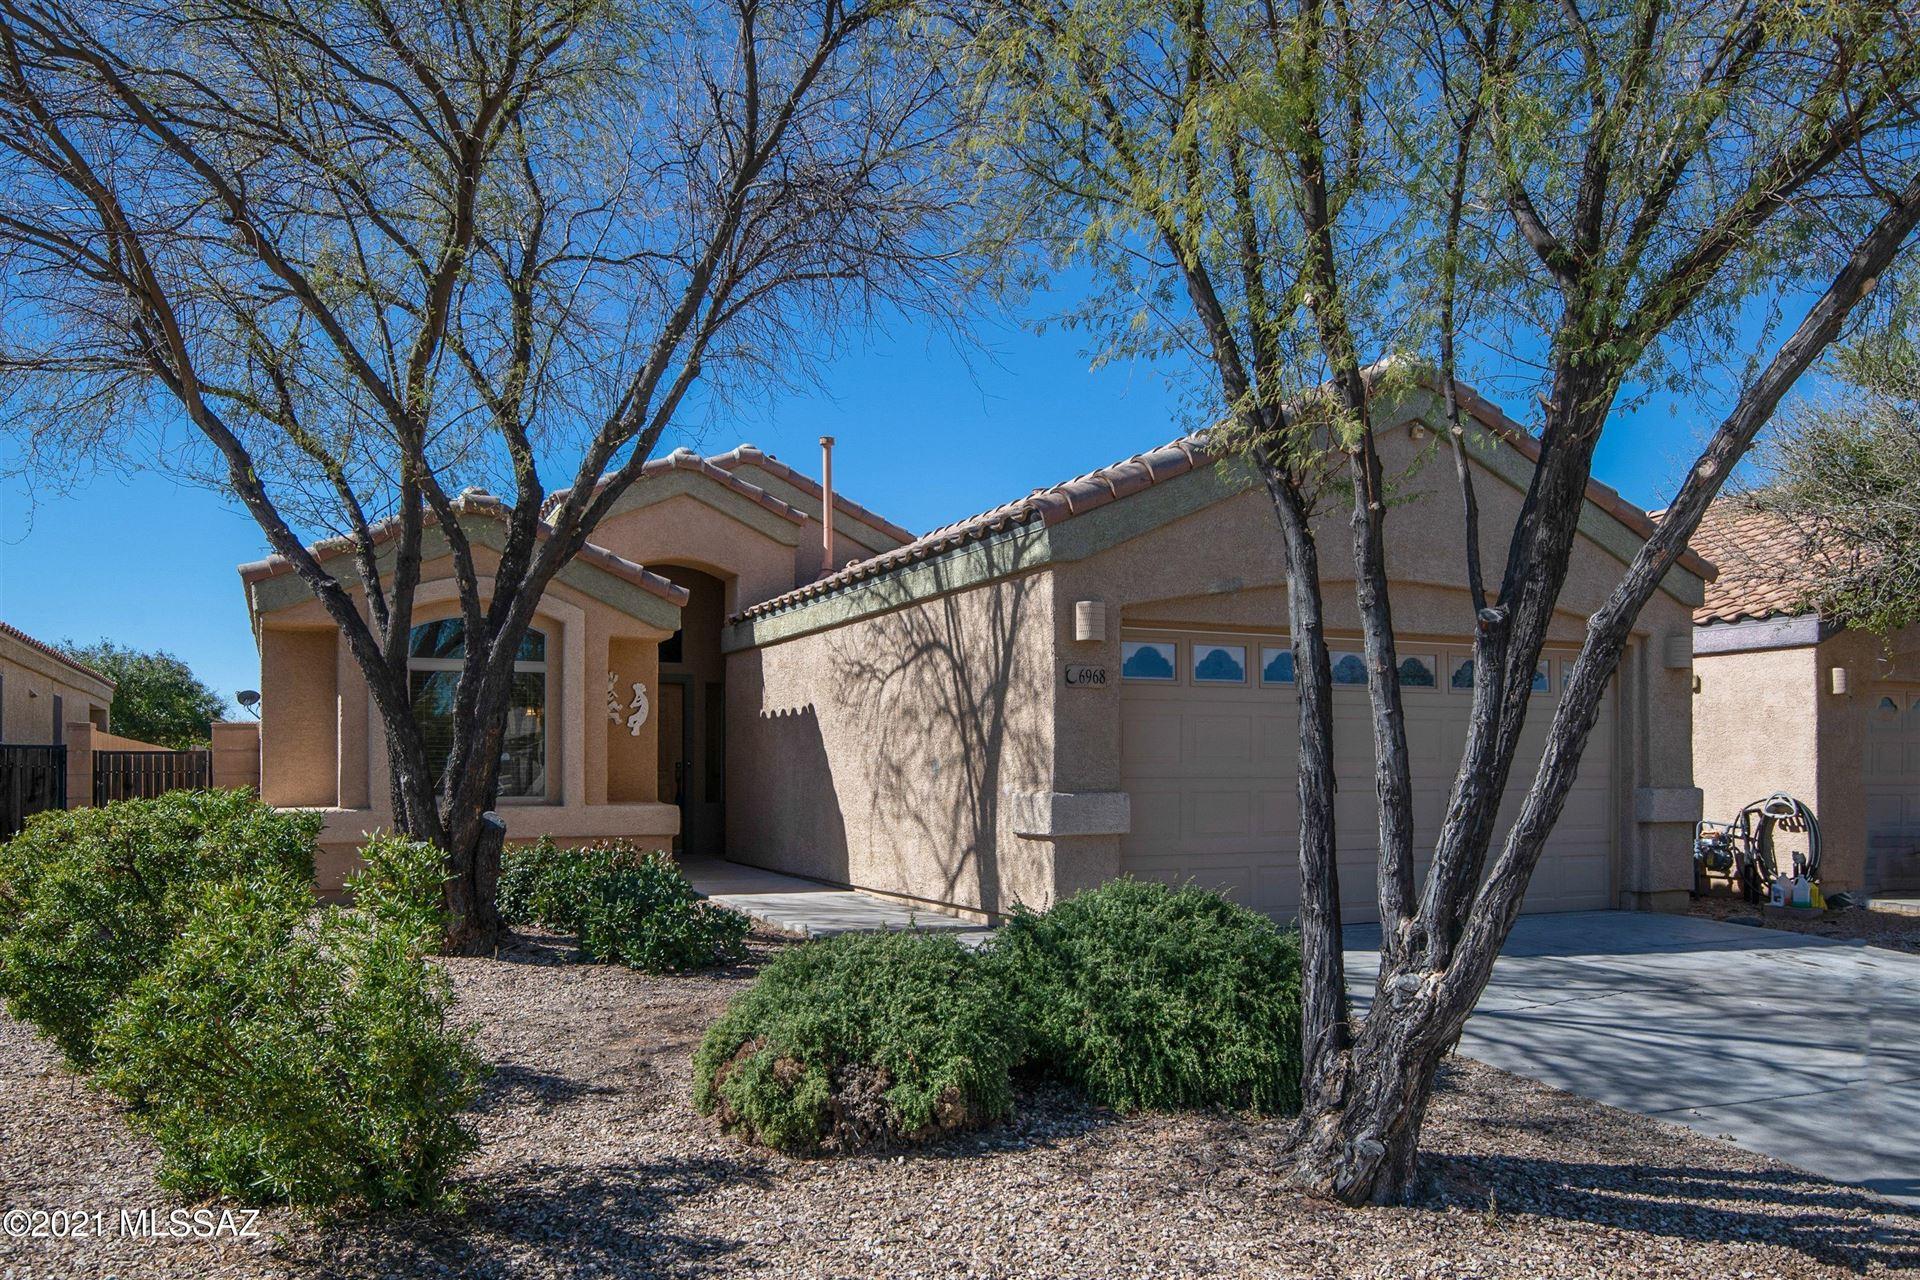 6968 S Spring Walk Drive, Tucson, AZ 85757 - MLS#: 22104612